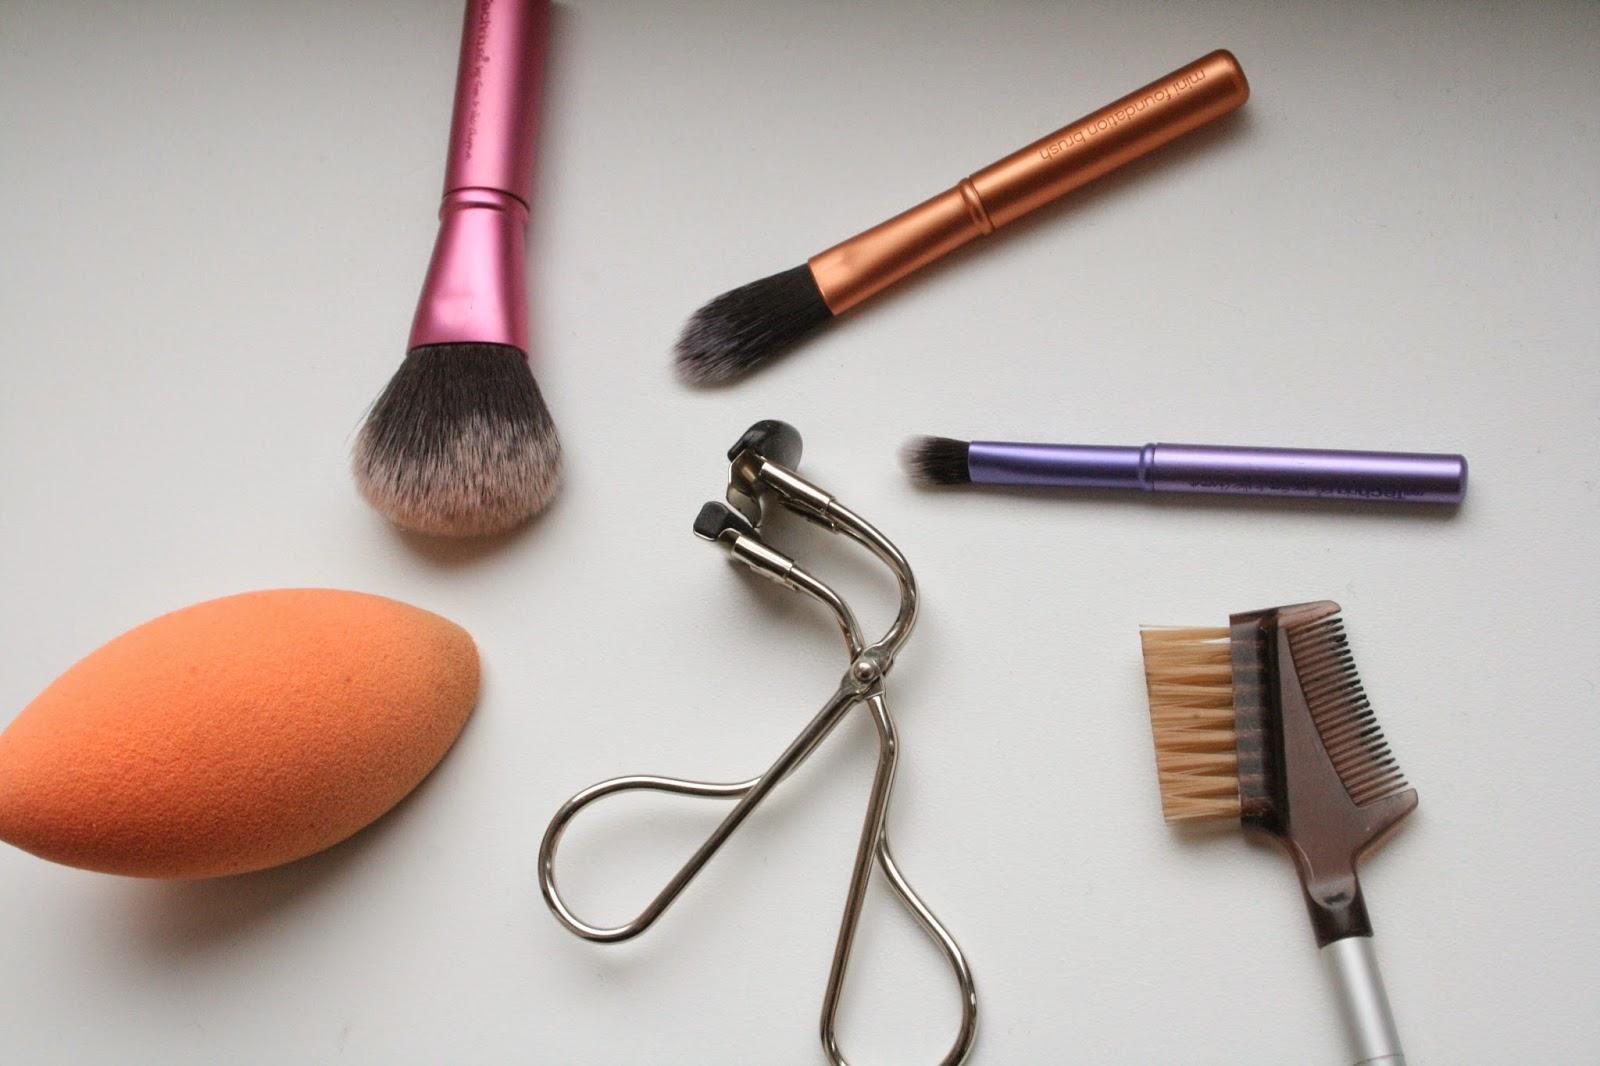 Real Techniques Travel brush trio, Real Techniques Blending Sponge, Shu Uemura Eyelash Curler, Ecotools Eyebrow brush